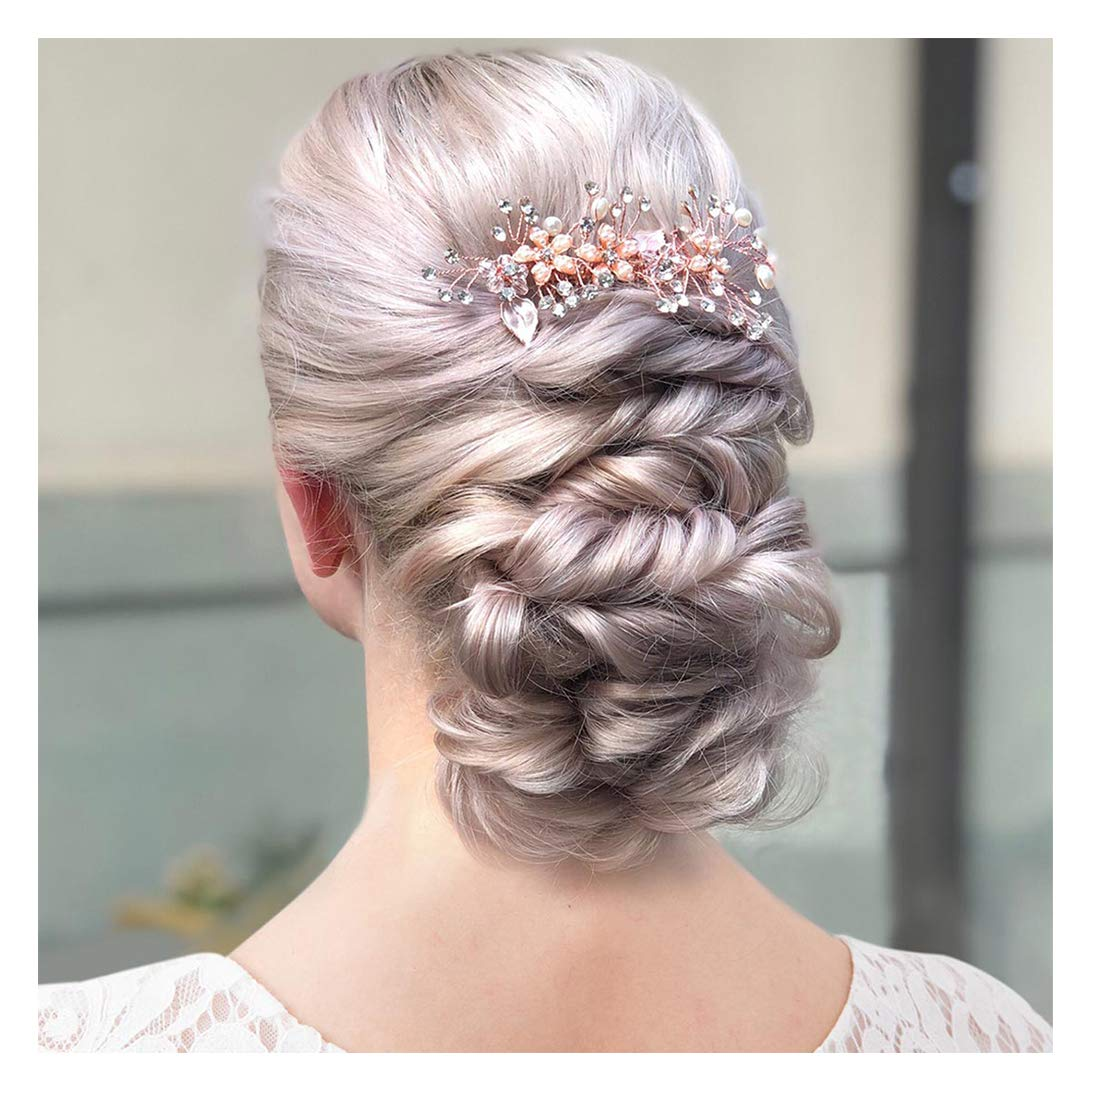 Sweetv Rose Gold Bridal Hair Comb Clip Rhinestone Headpieces Wedding Hair Accessories For Women Girl Bride Walmart Com Walmart Com